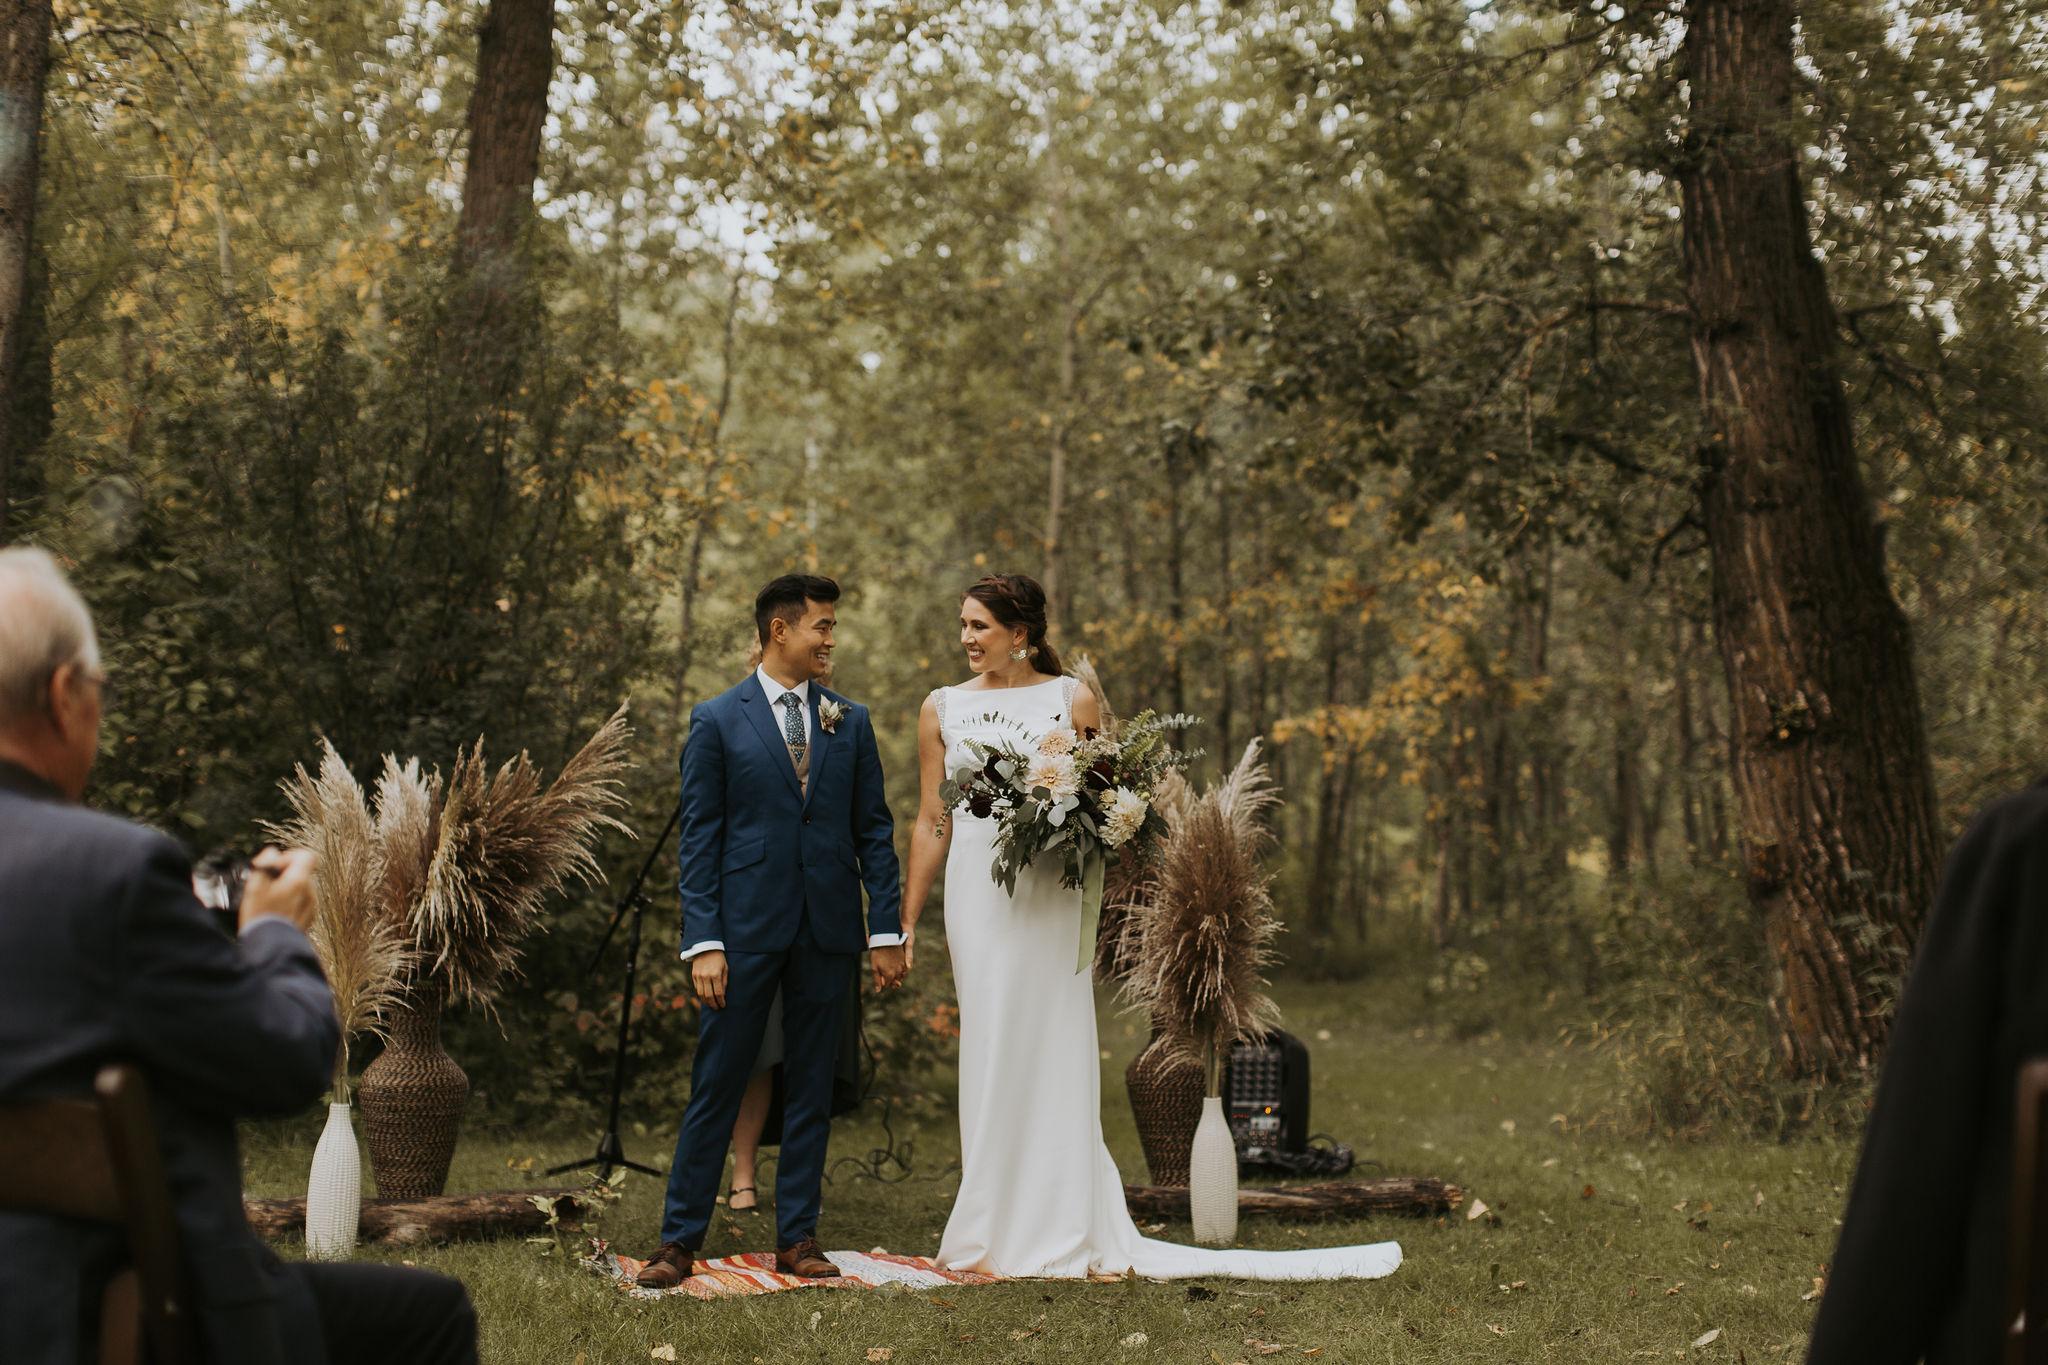 AK_Wedding_Ceremony-104.jpg